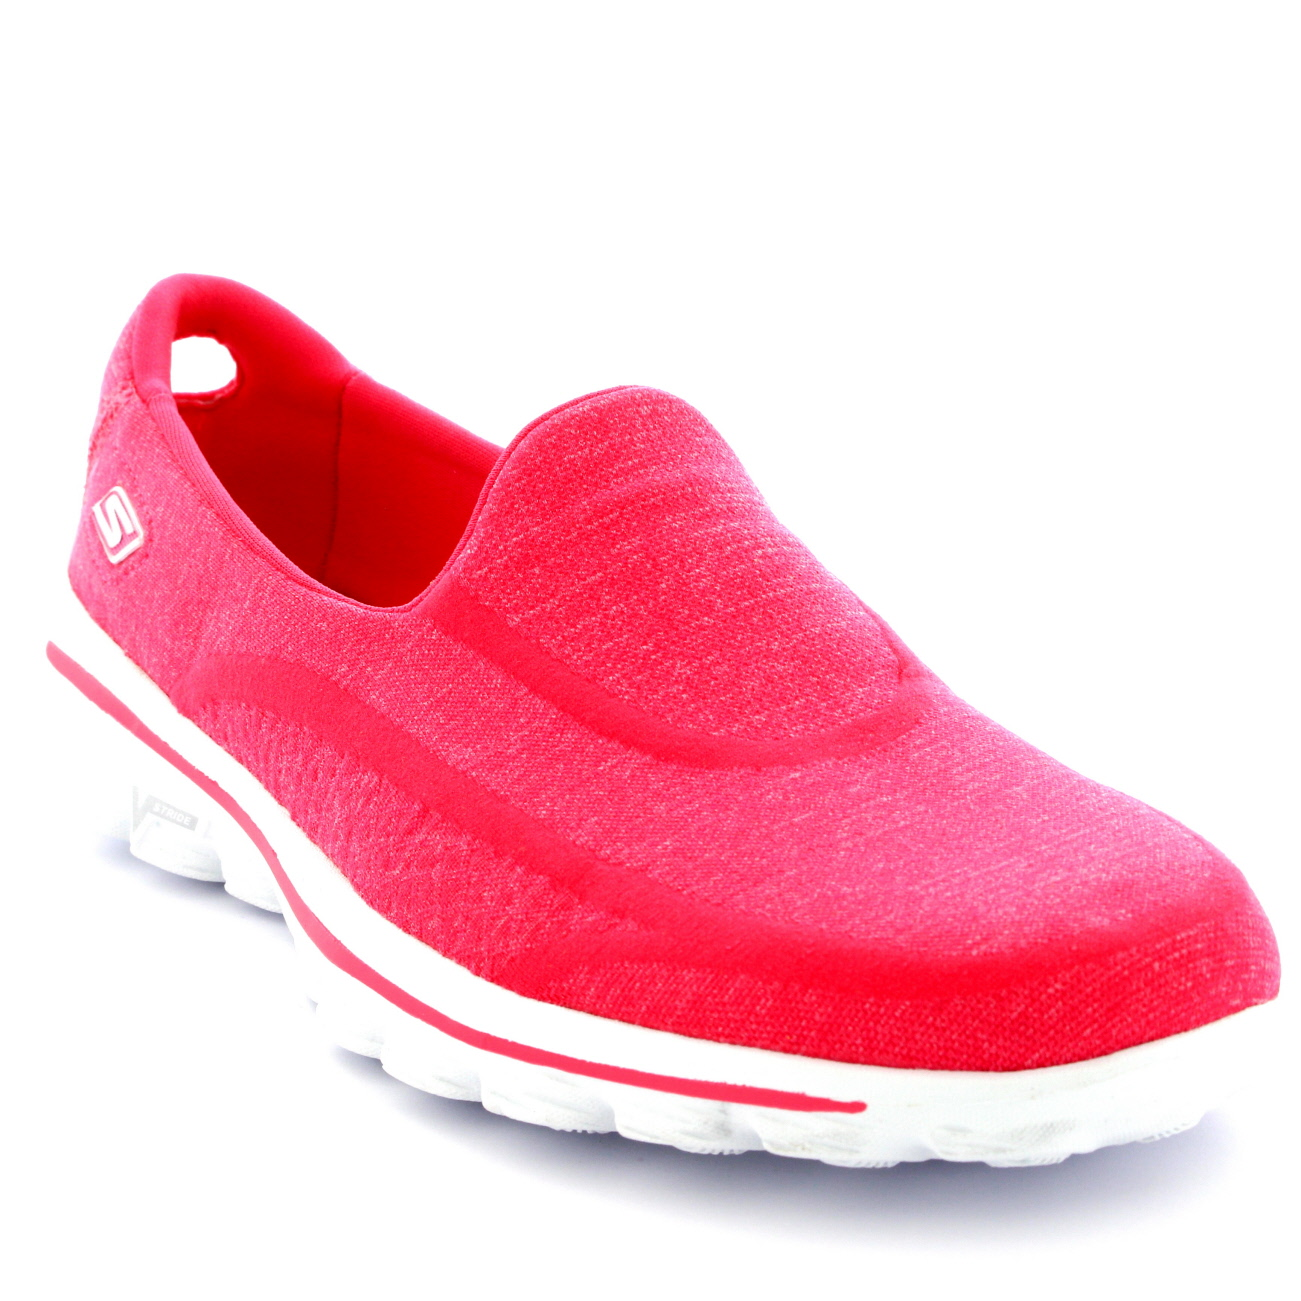 Nike Walk Fit Shoes Womens